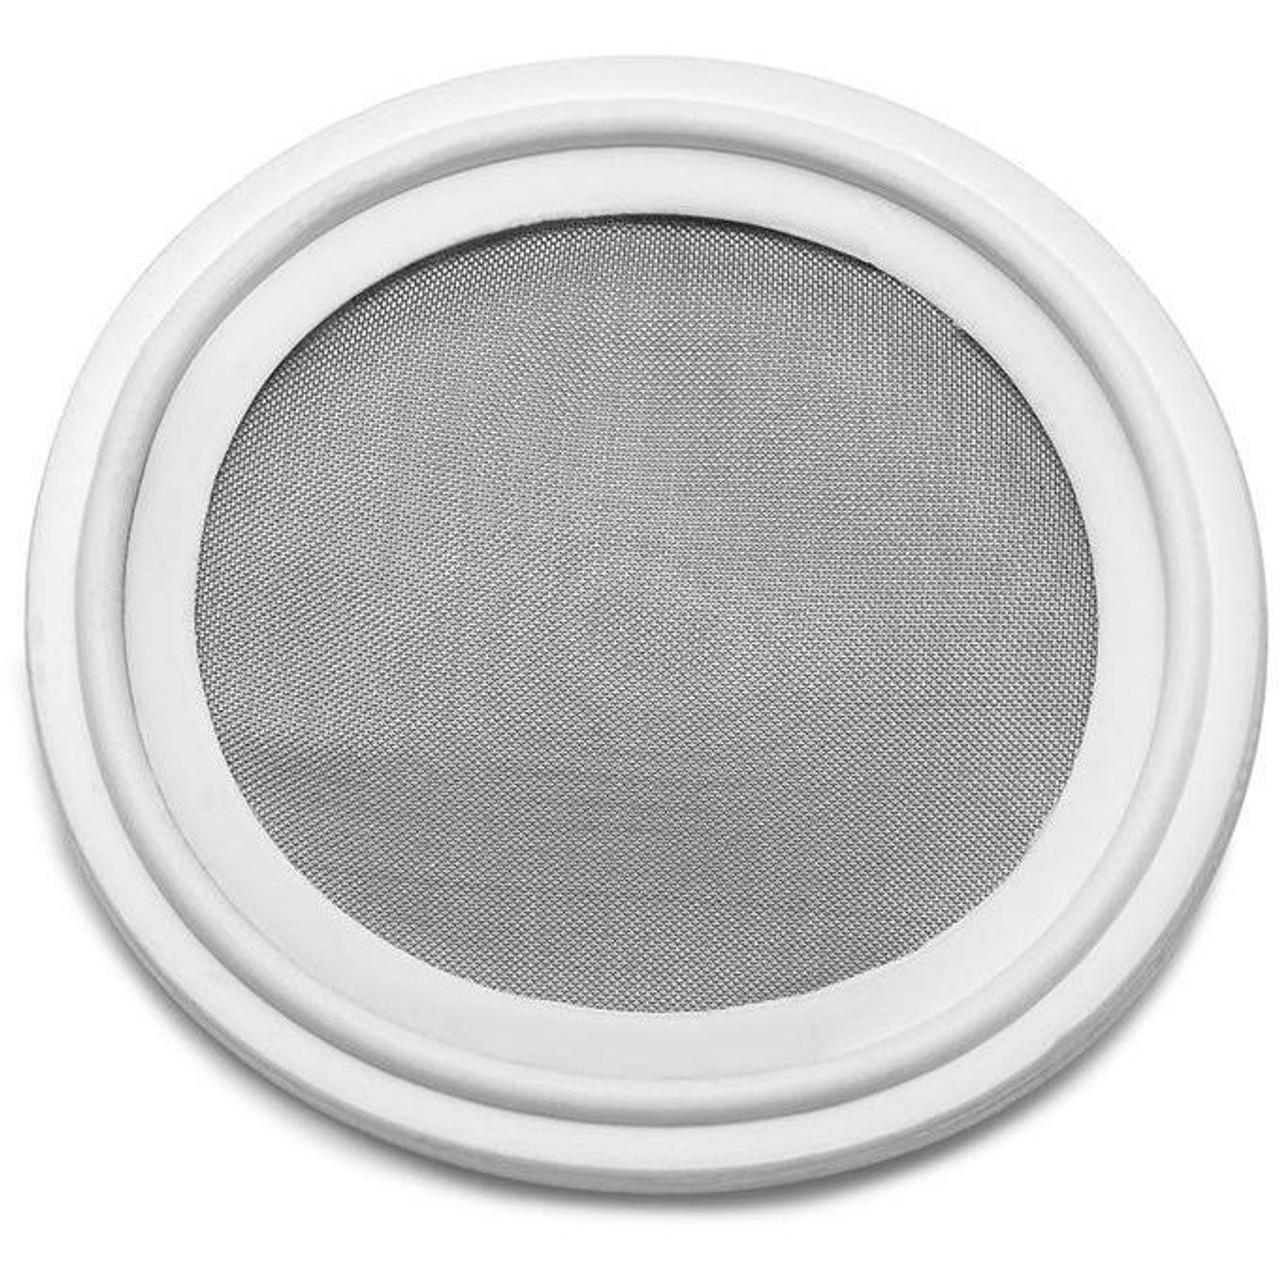 Silicone 100 Mesh (150 Micron)